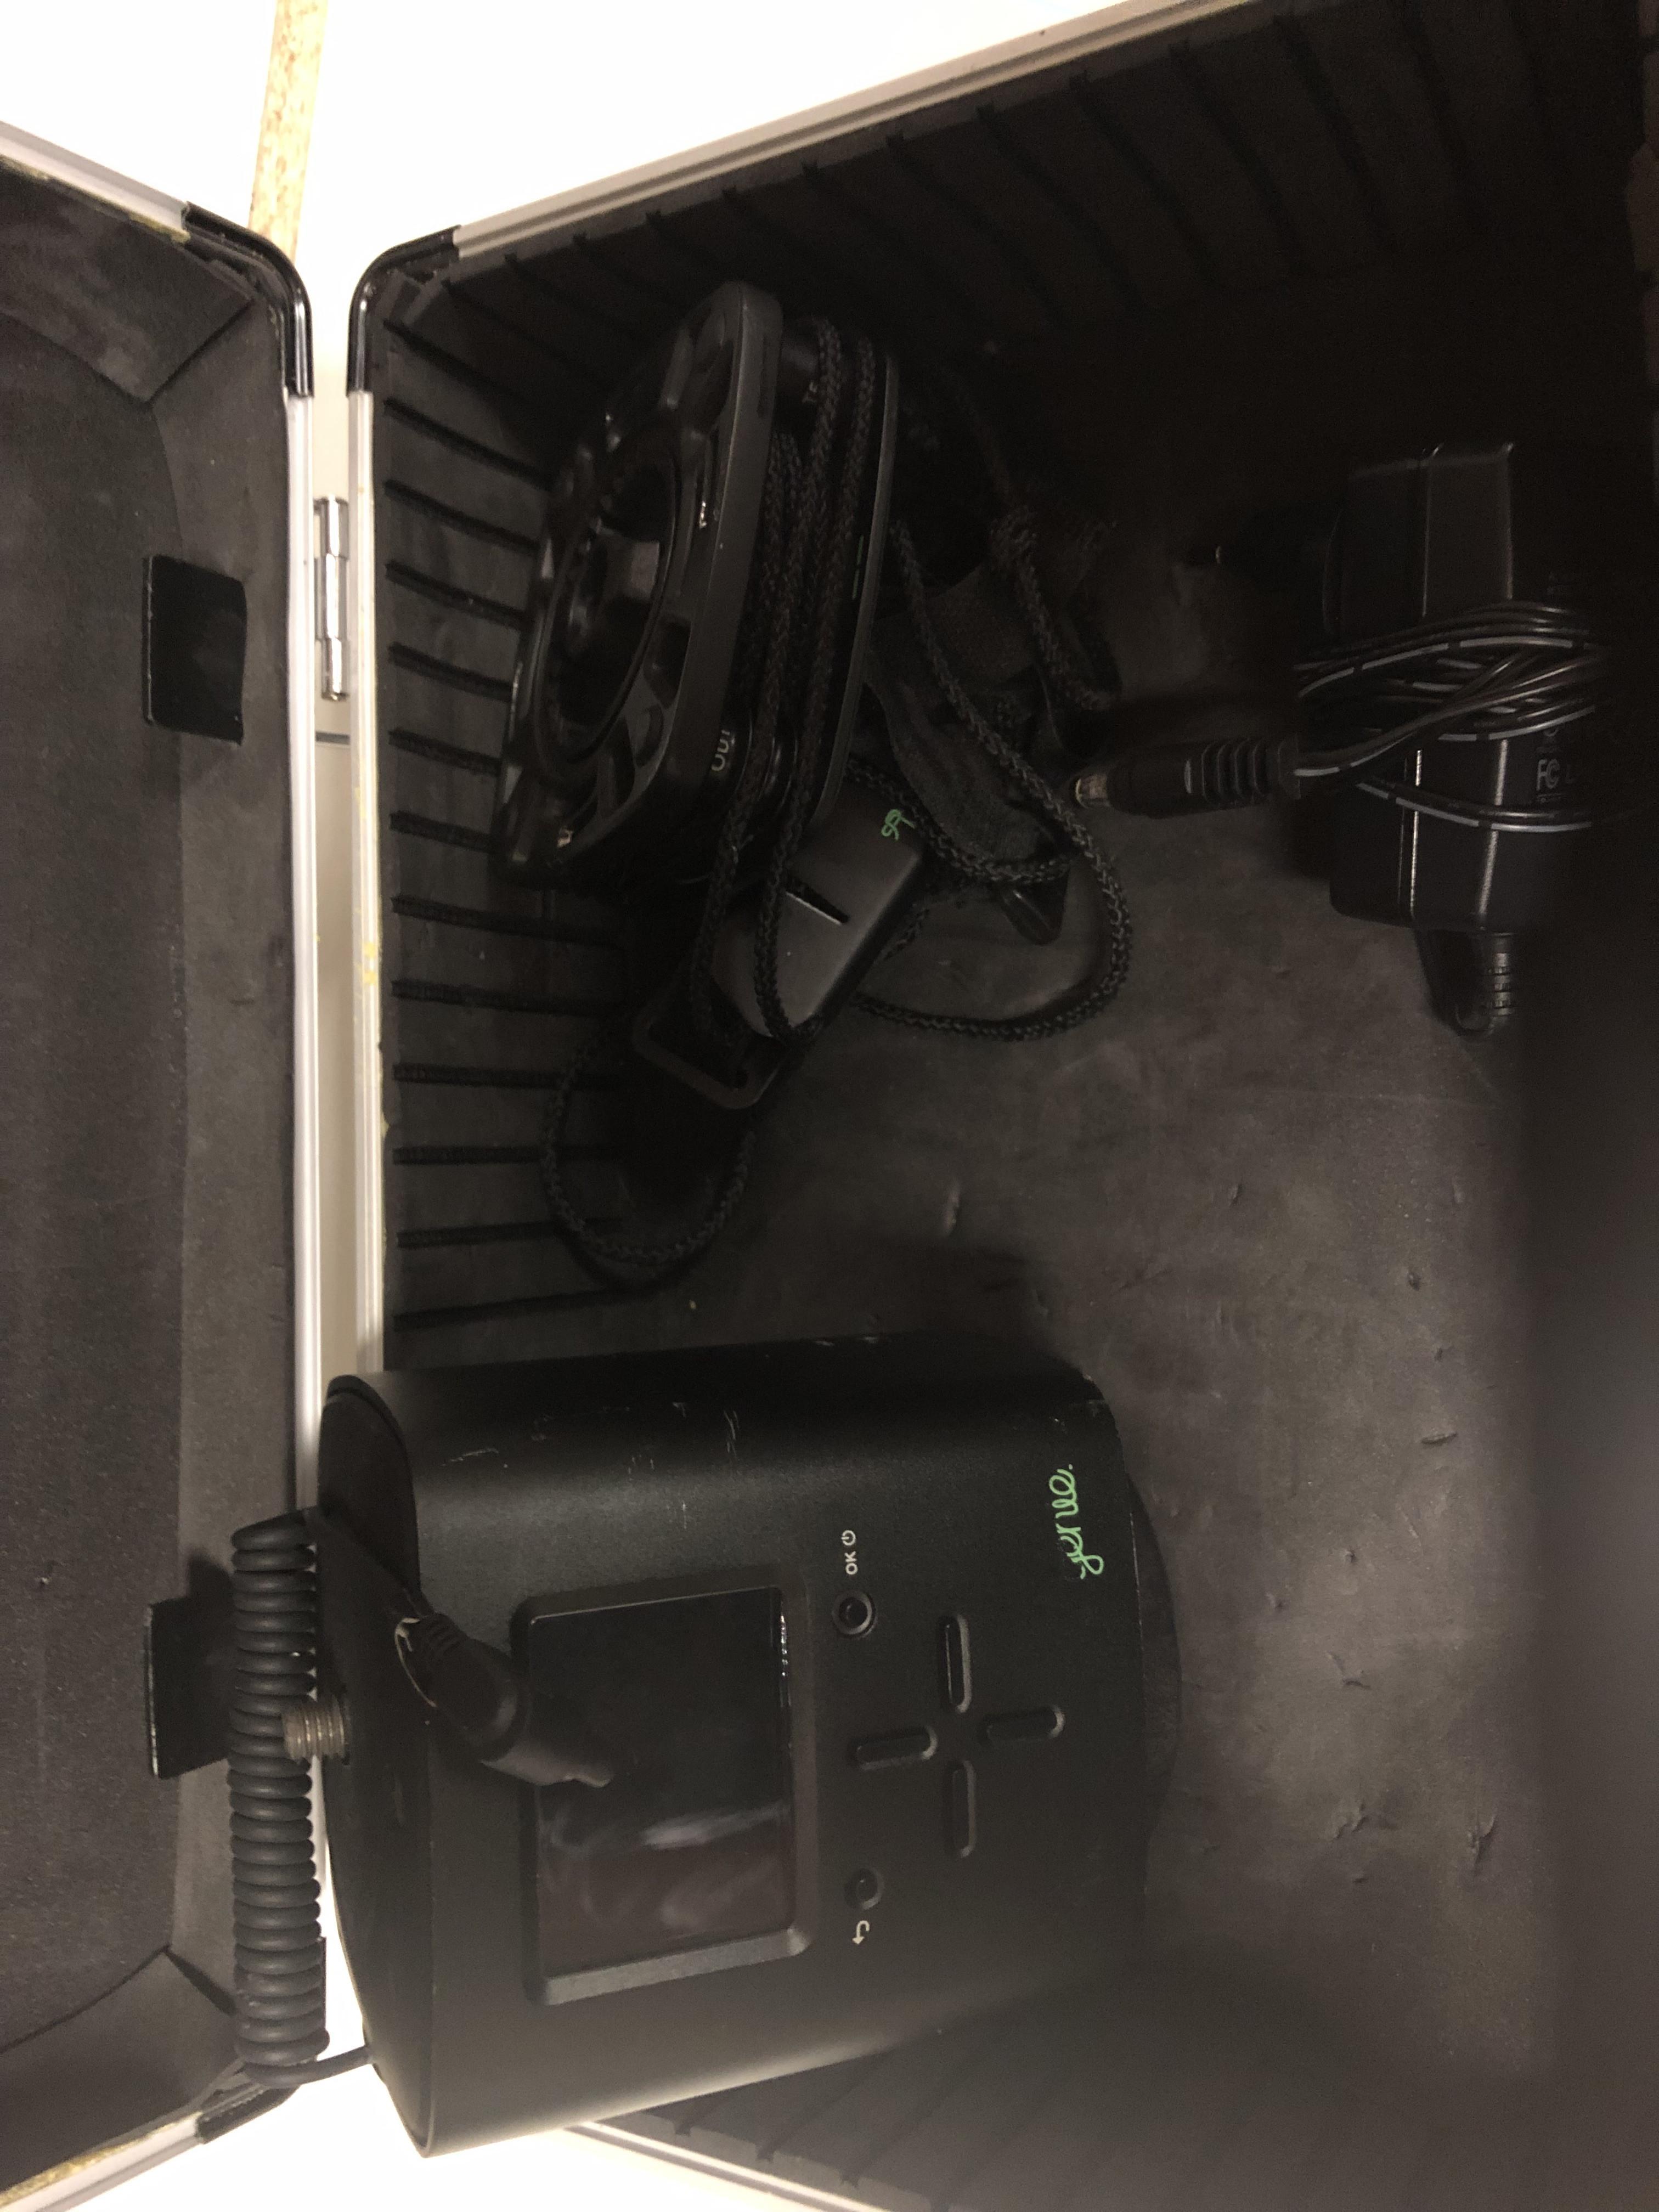 Syrp Genie rotule motoriseé pour time lapse et panorama 360°